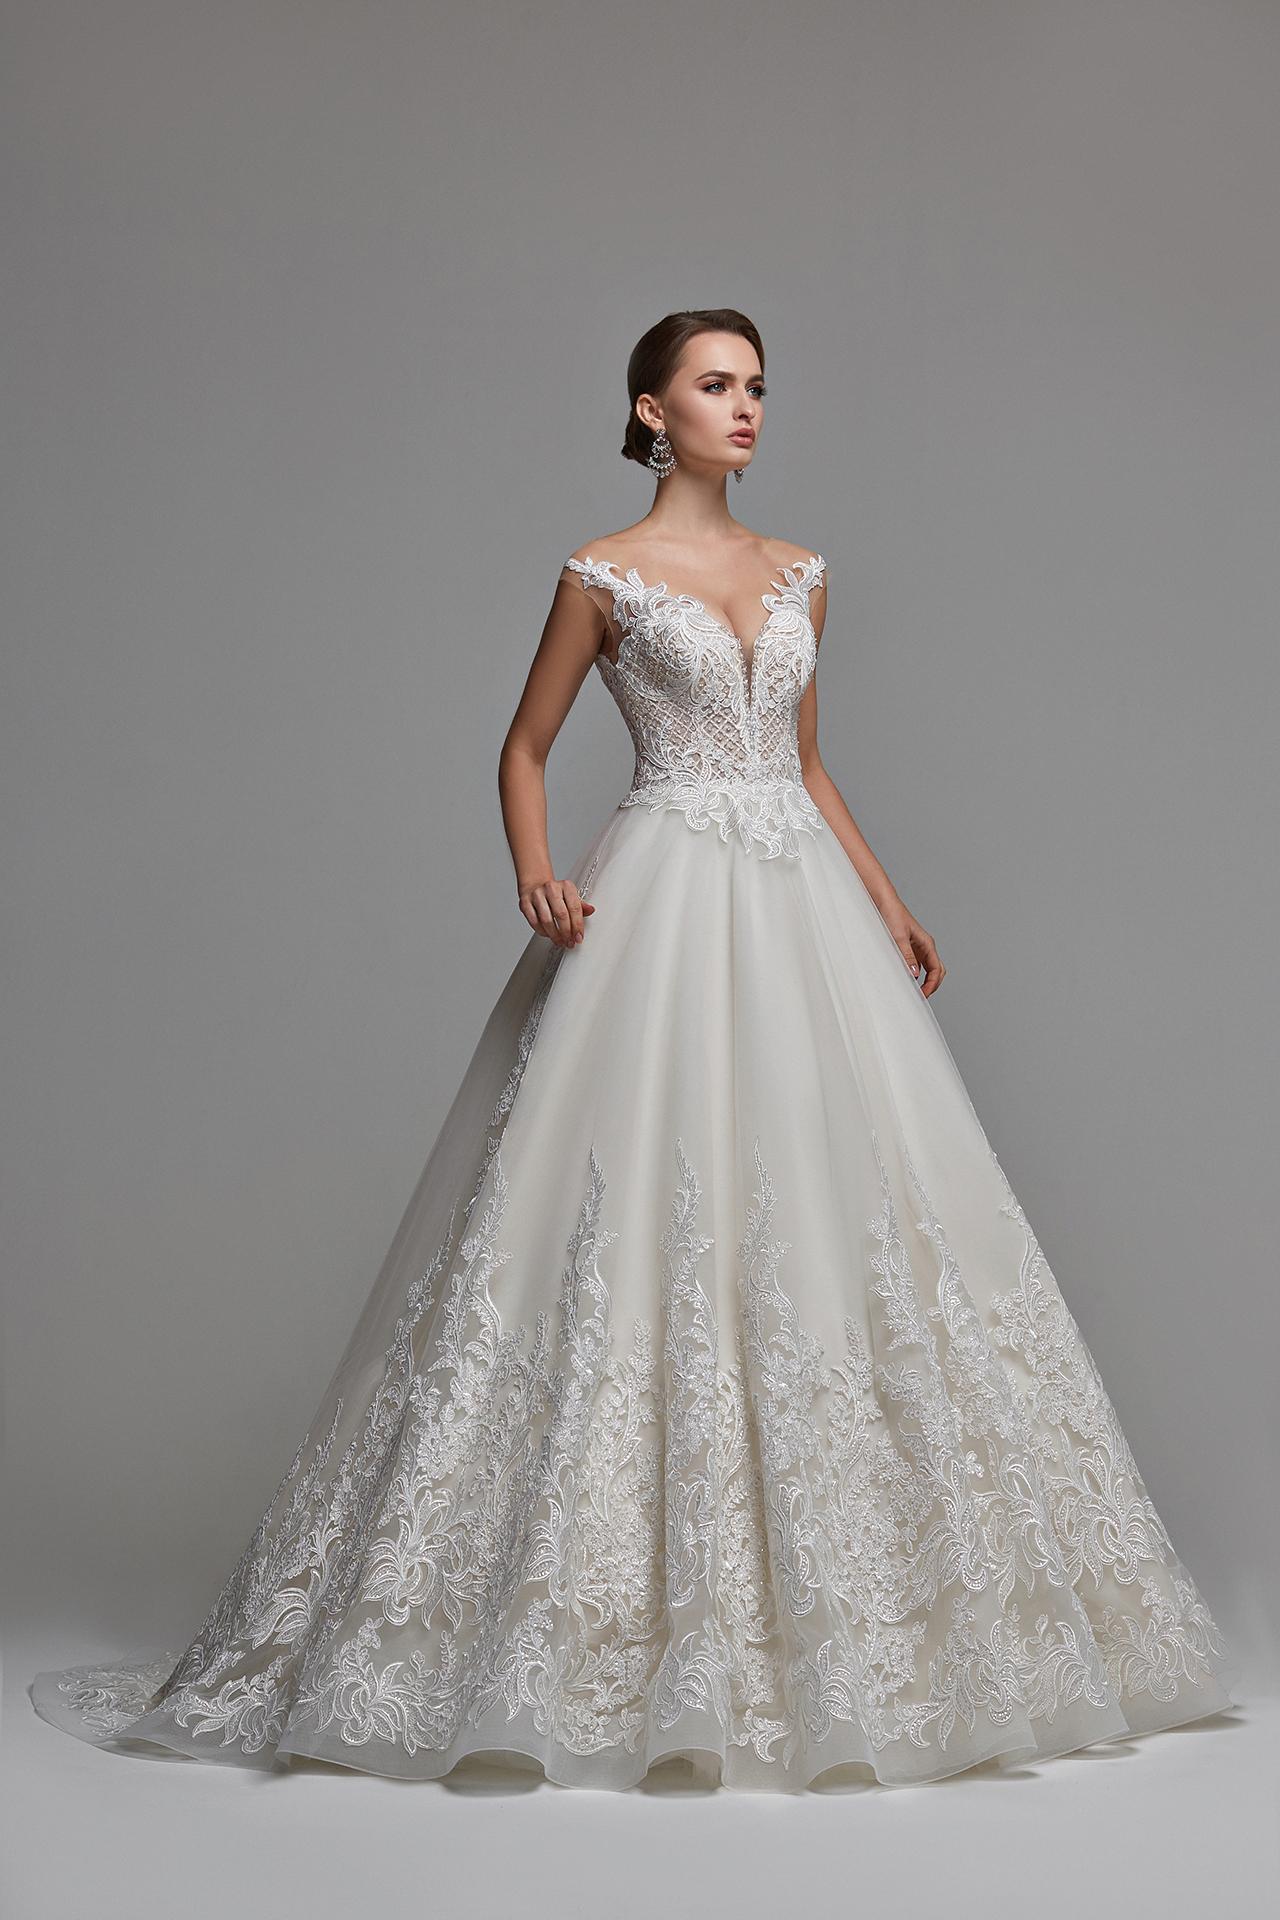 Buy Online Wedding Dress Monica Princess Ball Gown Off The Shoulder V Neckline,Lace Beach Boho Wedding Dress